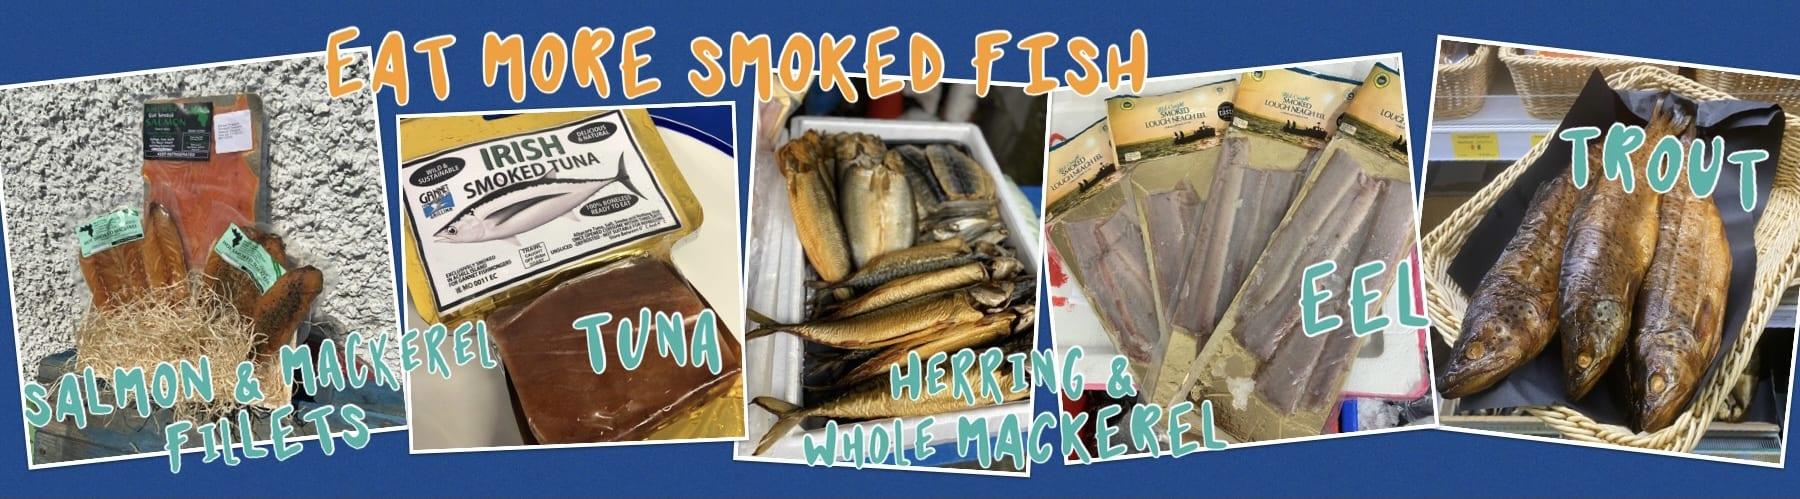 Smoked-banner-image